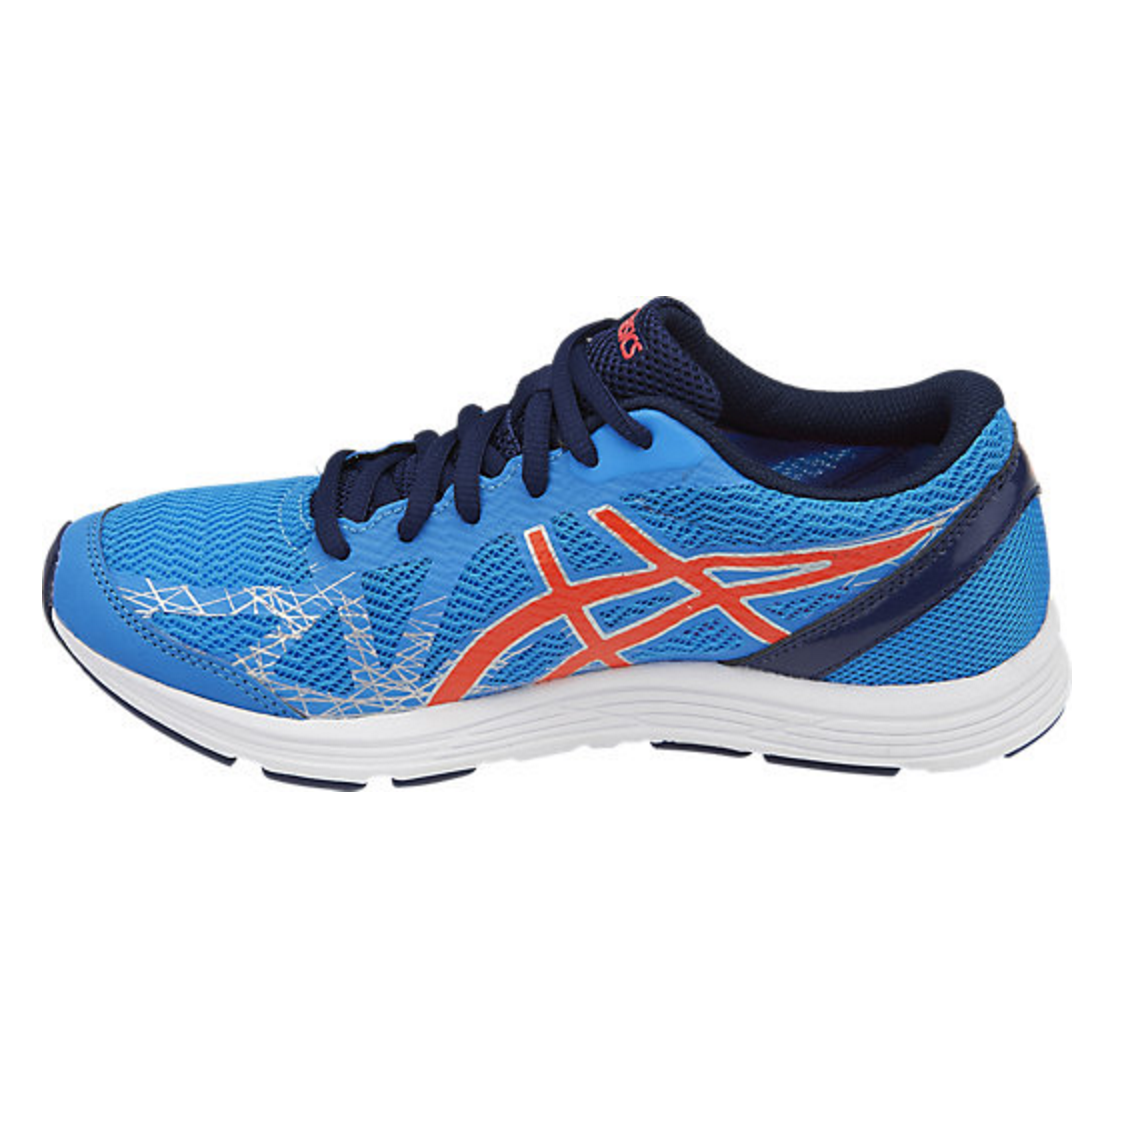 1ba2b39ac2 Asics Gel Hyper Speed 7 — TRS - The Running Shop